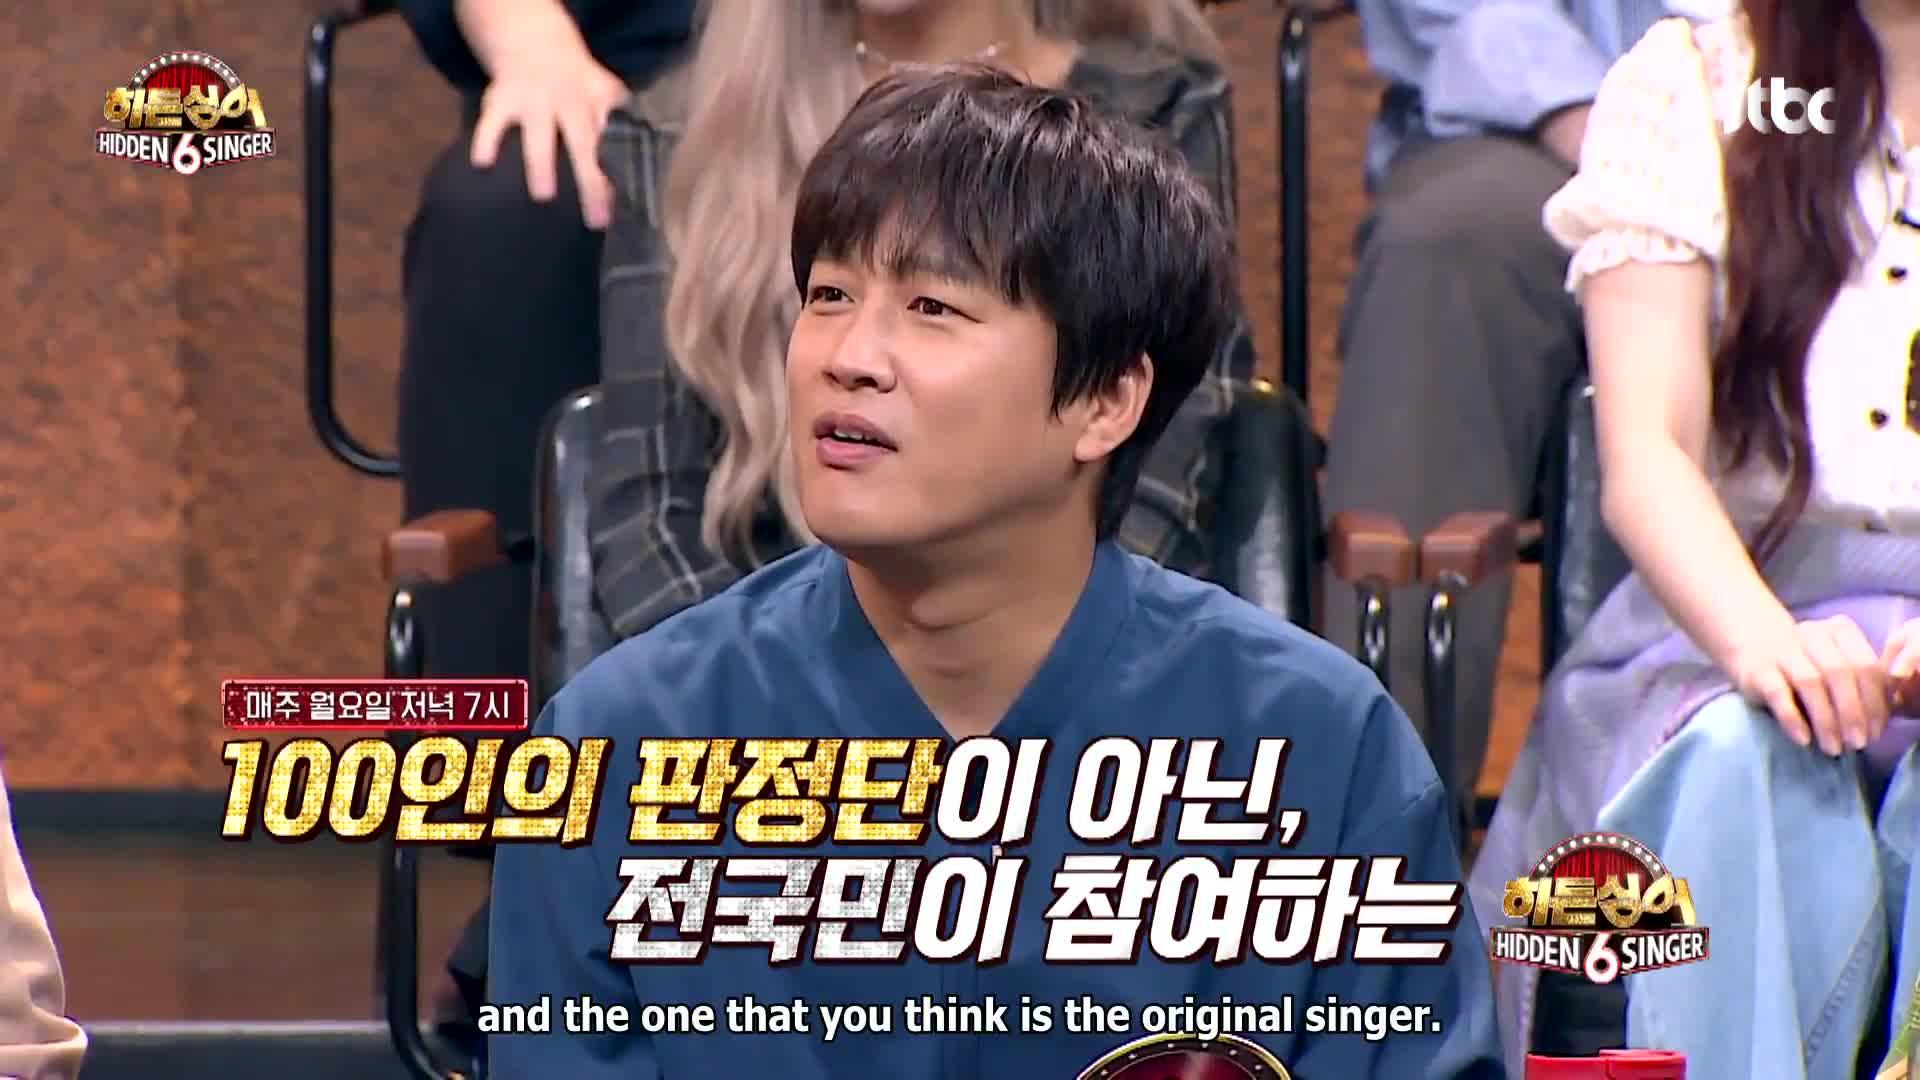 Hidden Singer: Season 6